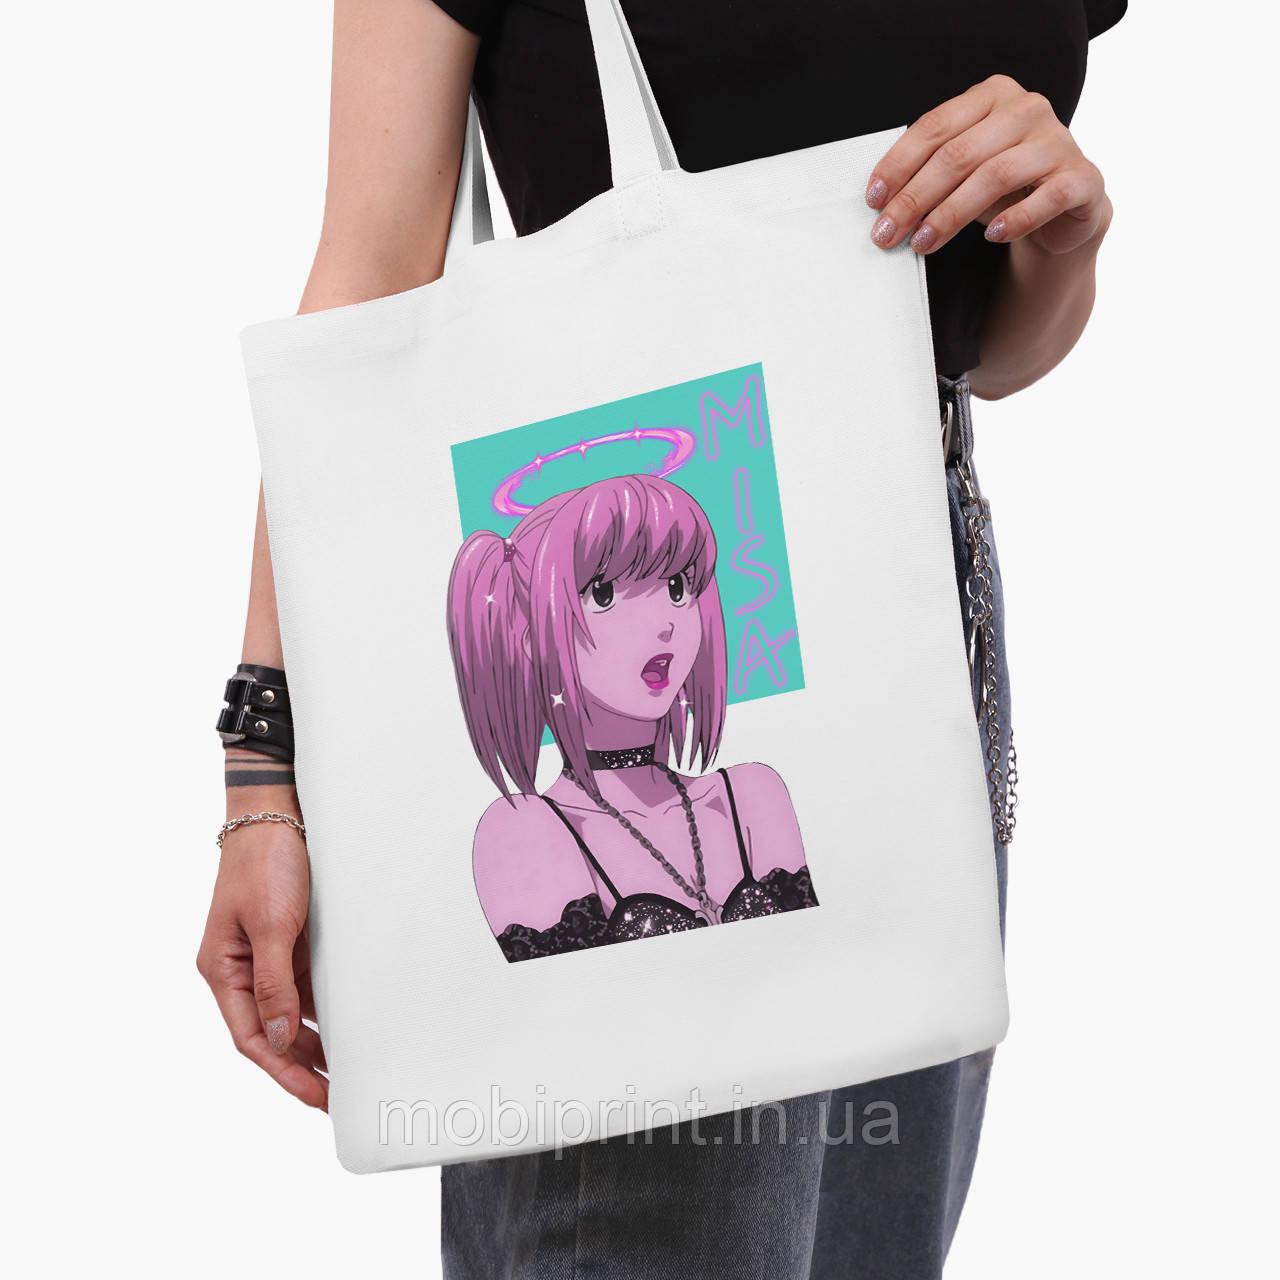 Еко сумка шоппер біла Міса Аманэ Зошит смерті (Misa Amane Death Note) (9227-2827-3) 41*35 см